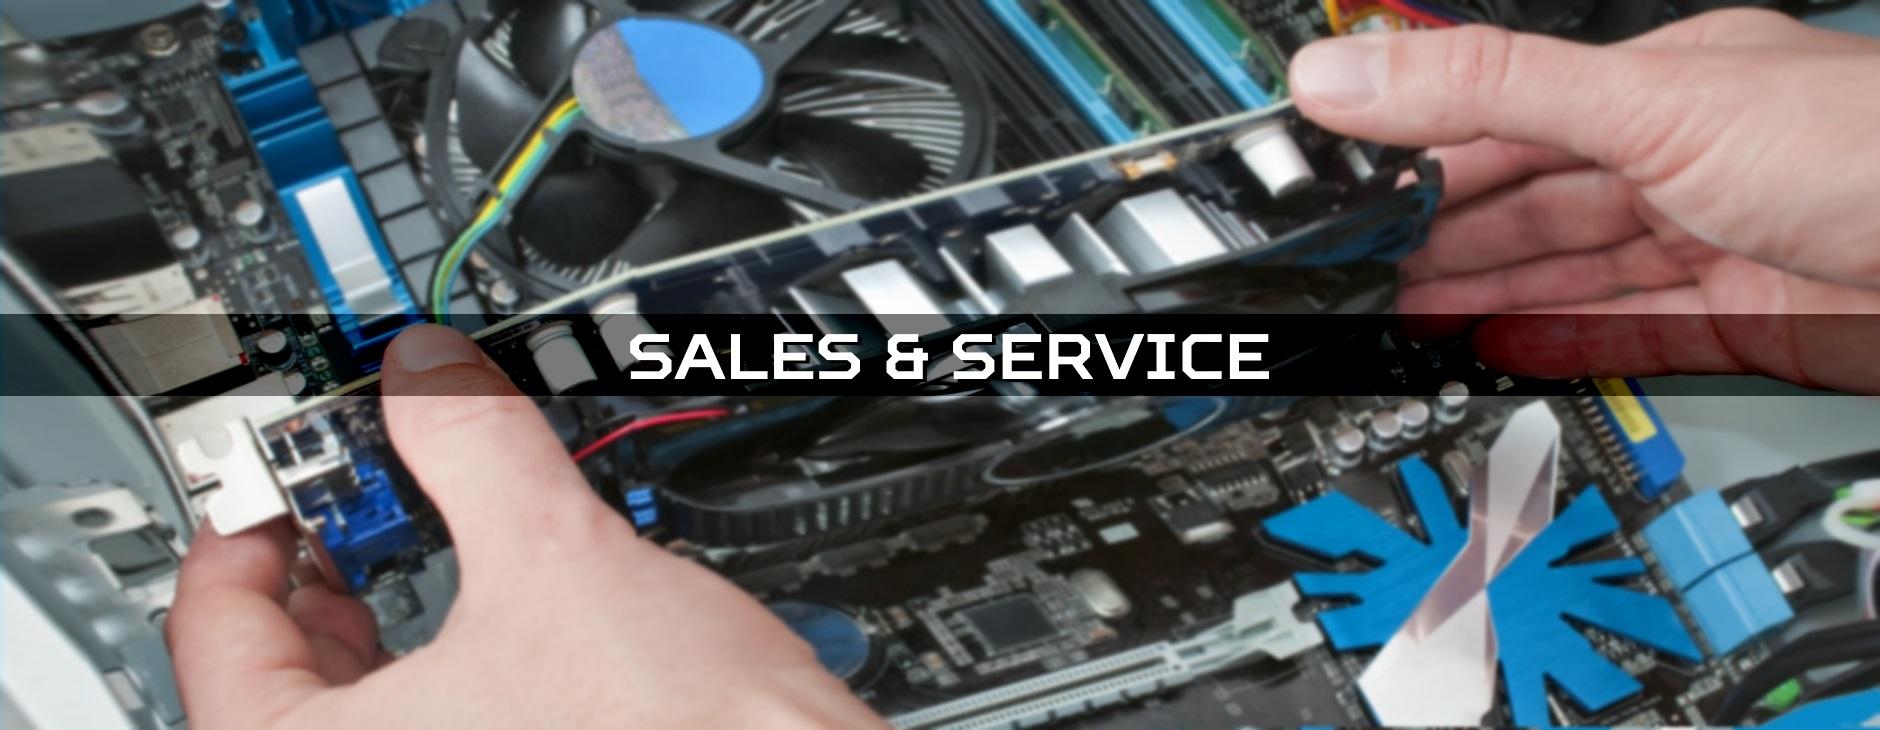 Sales-Service-3.jpg